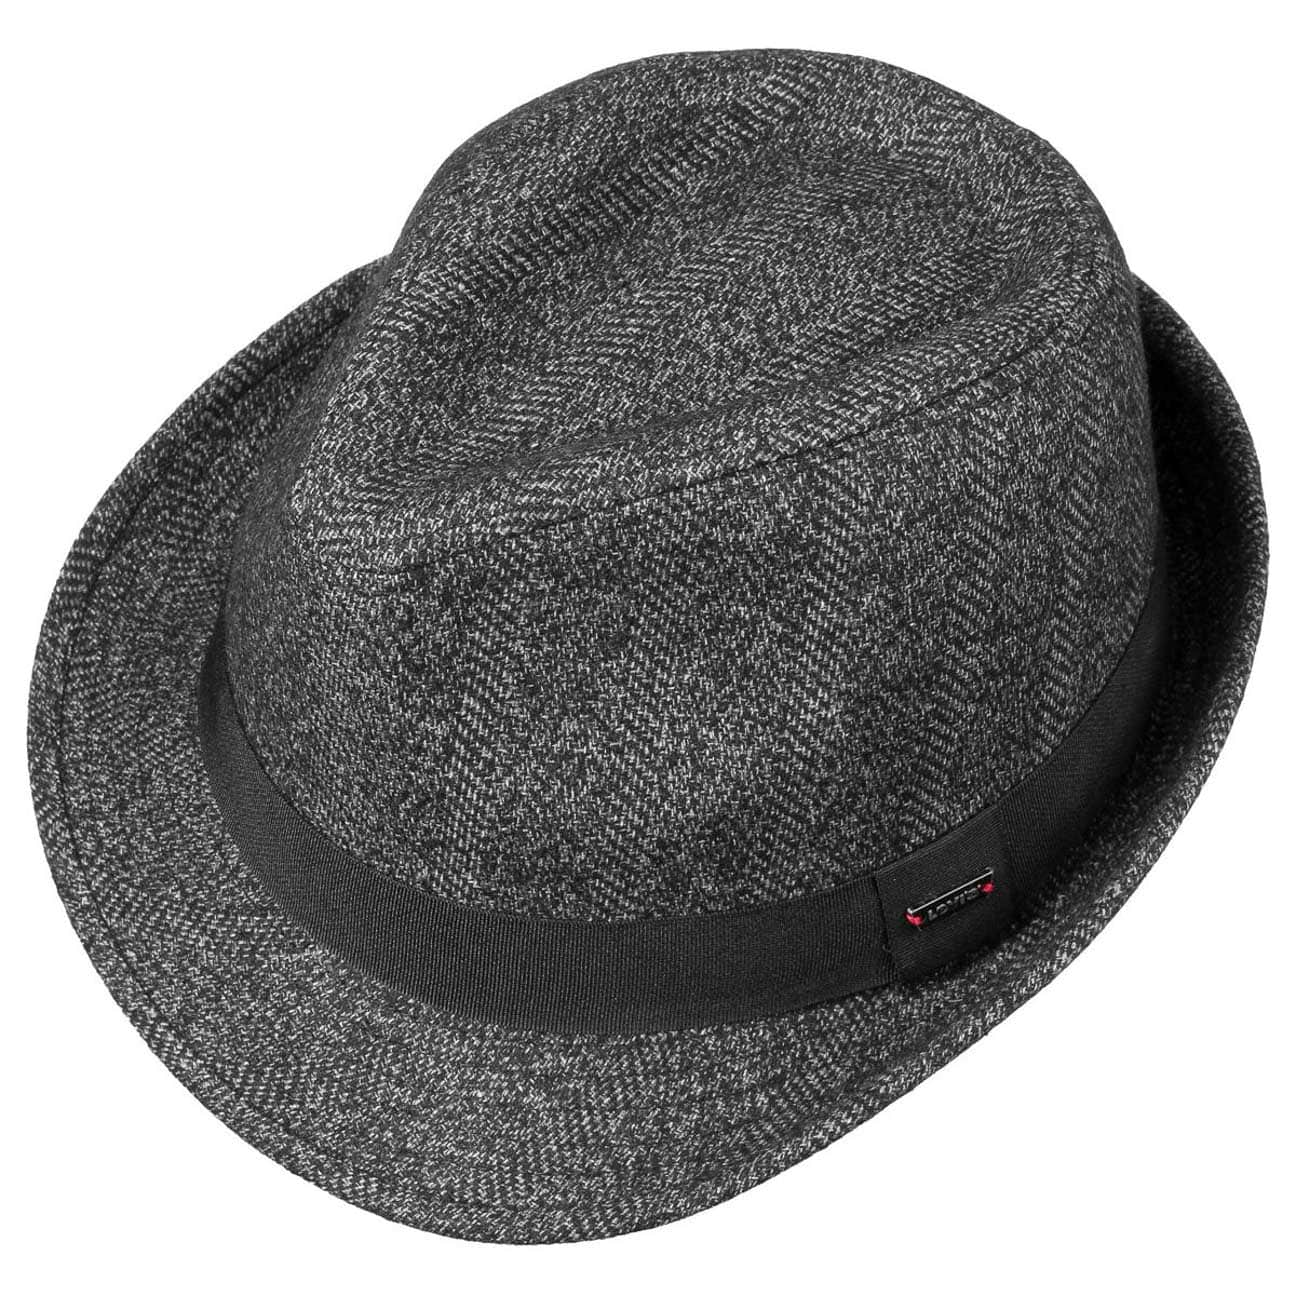 Sombrero Capino Wool Trilby by Levi´s - Sombreros - sombreroshop.es 85543c9816d